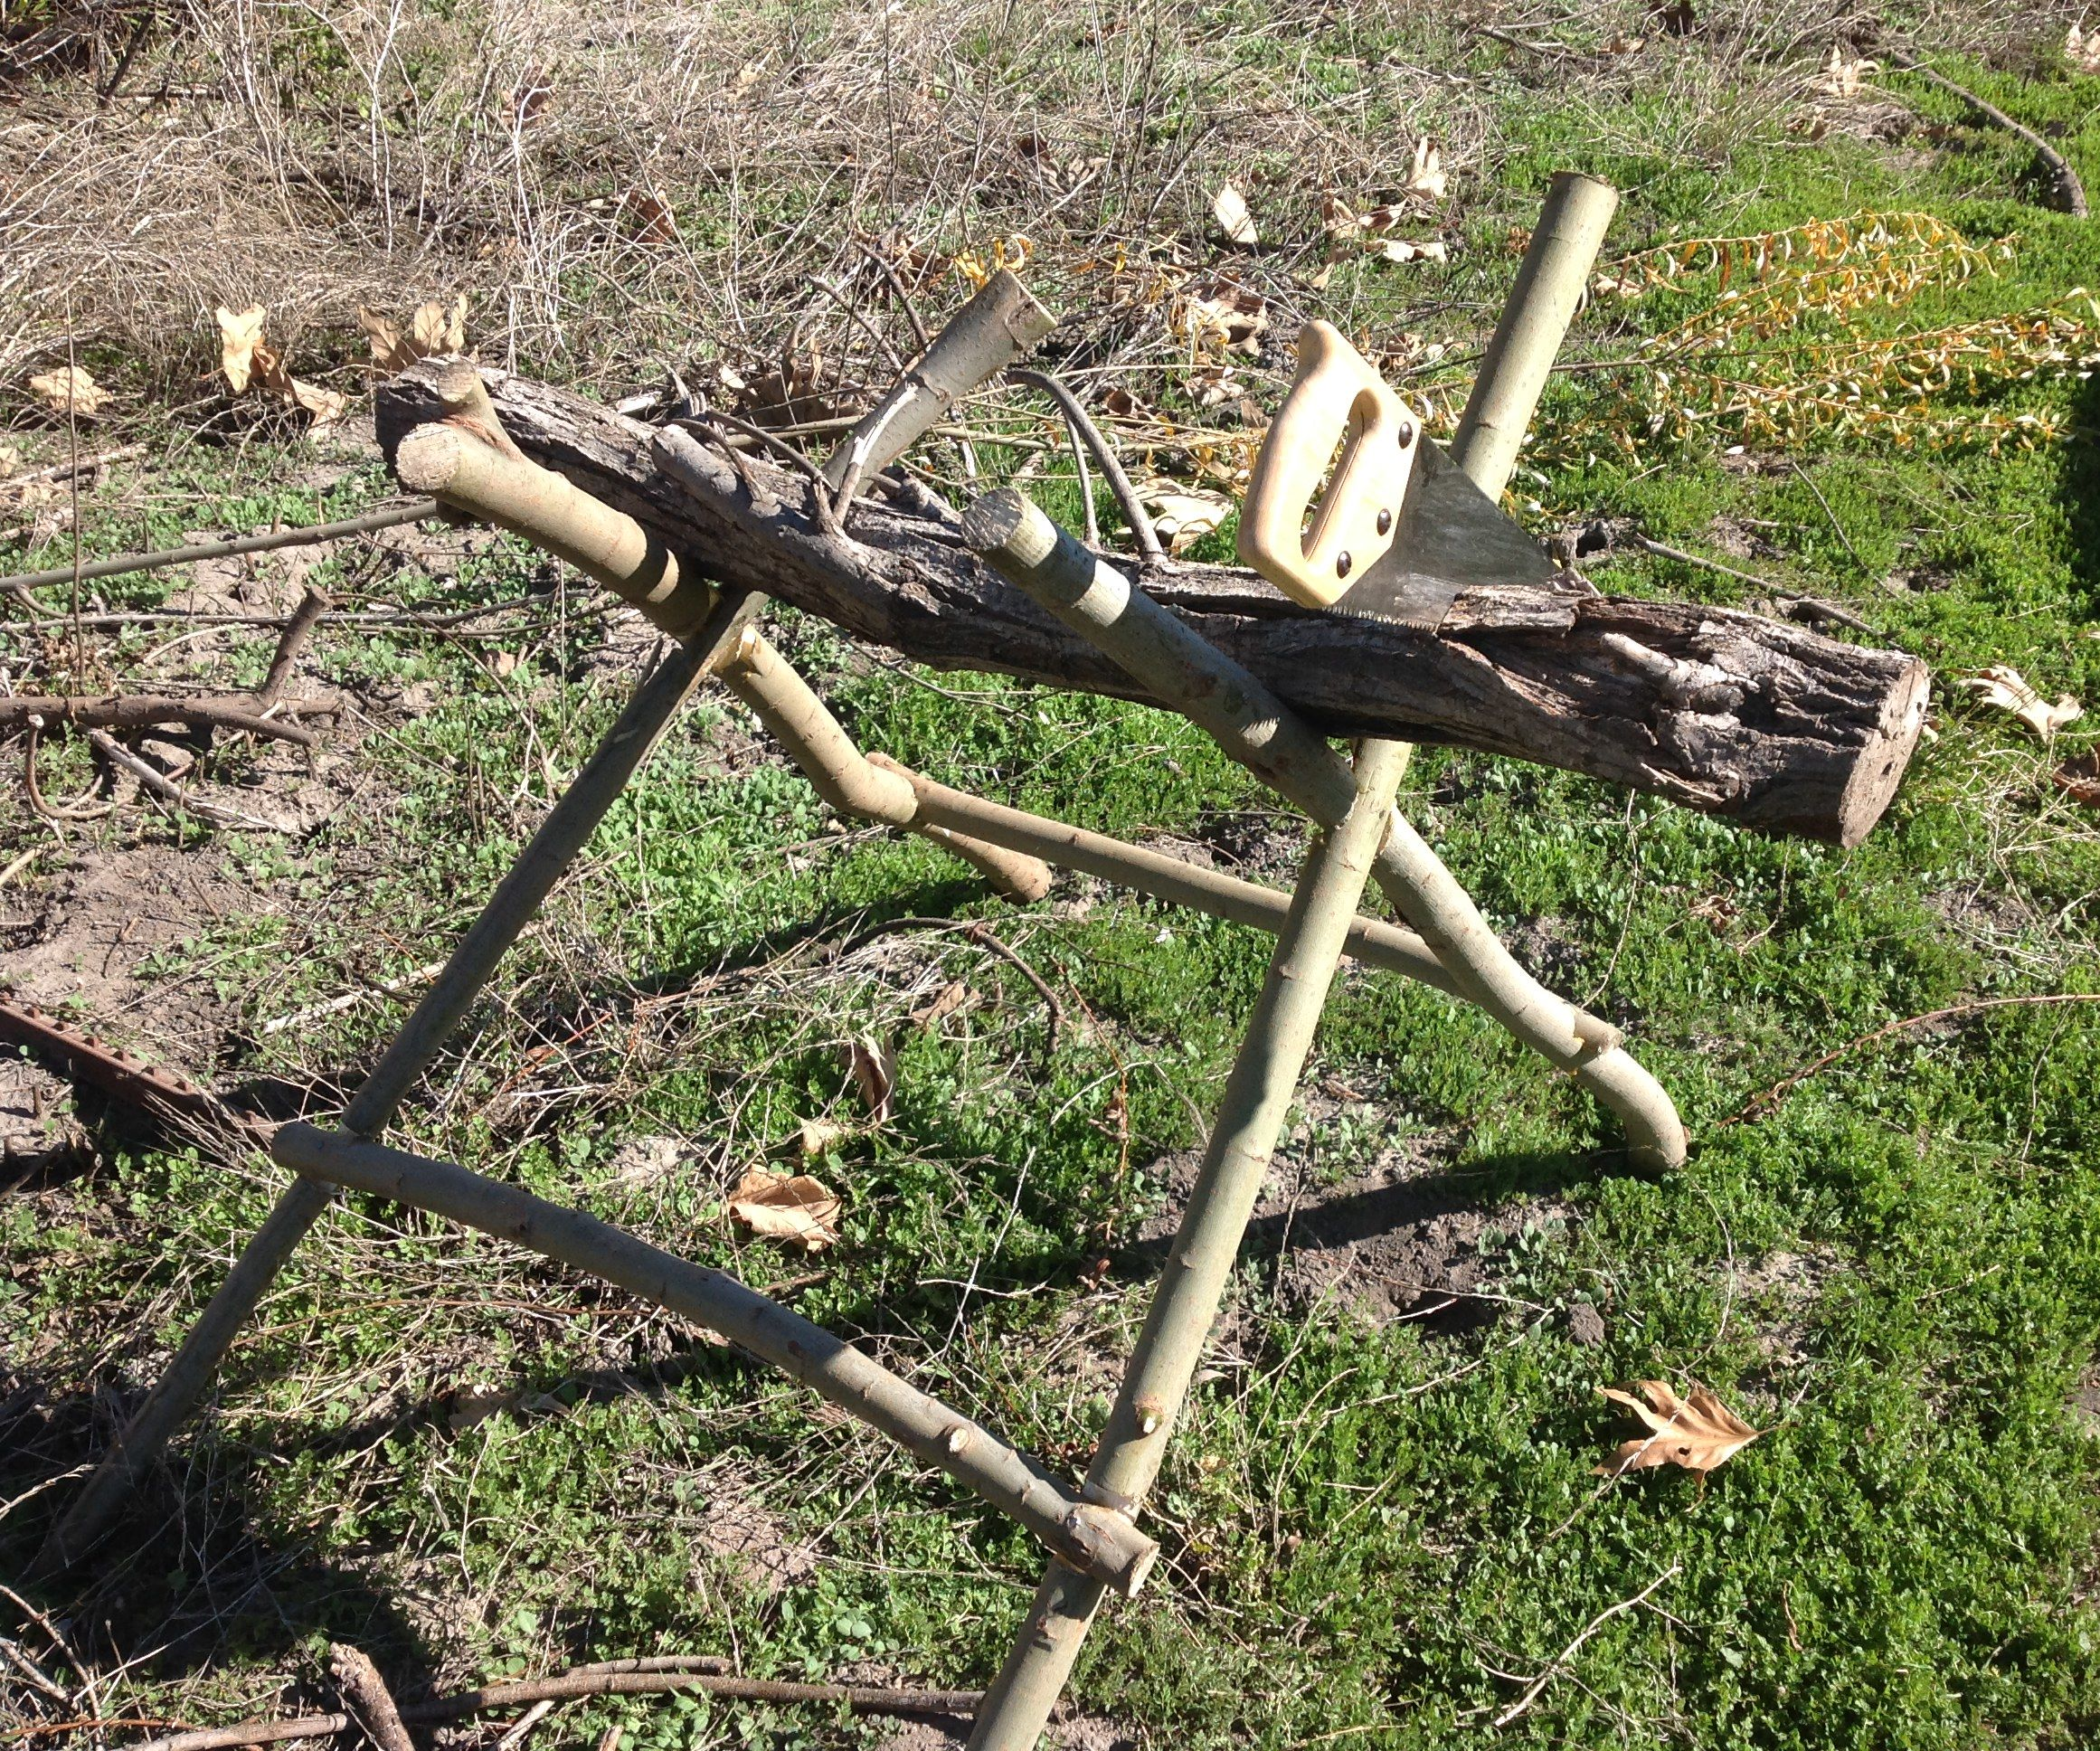 Building the Saw Donkey